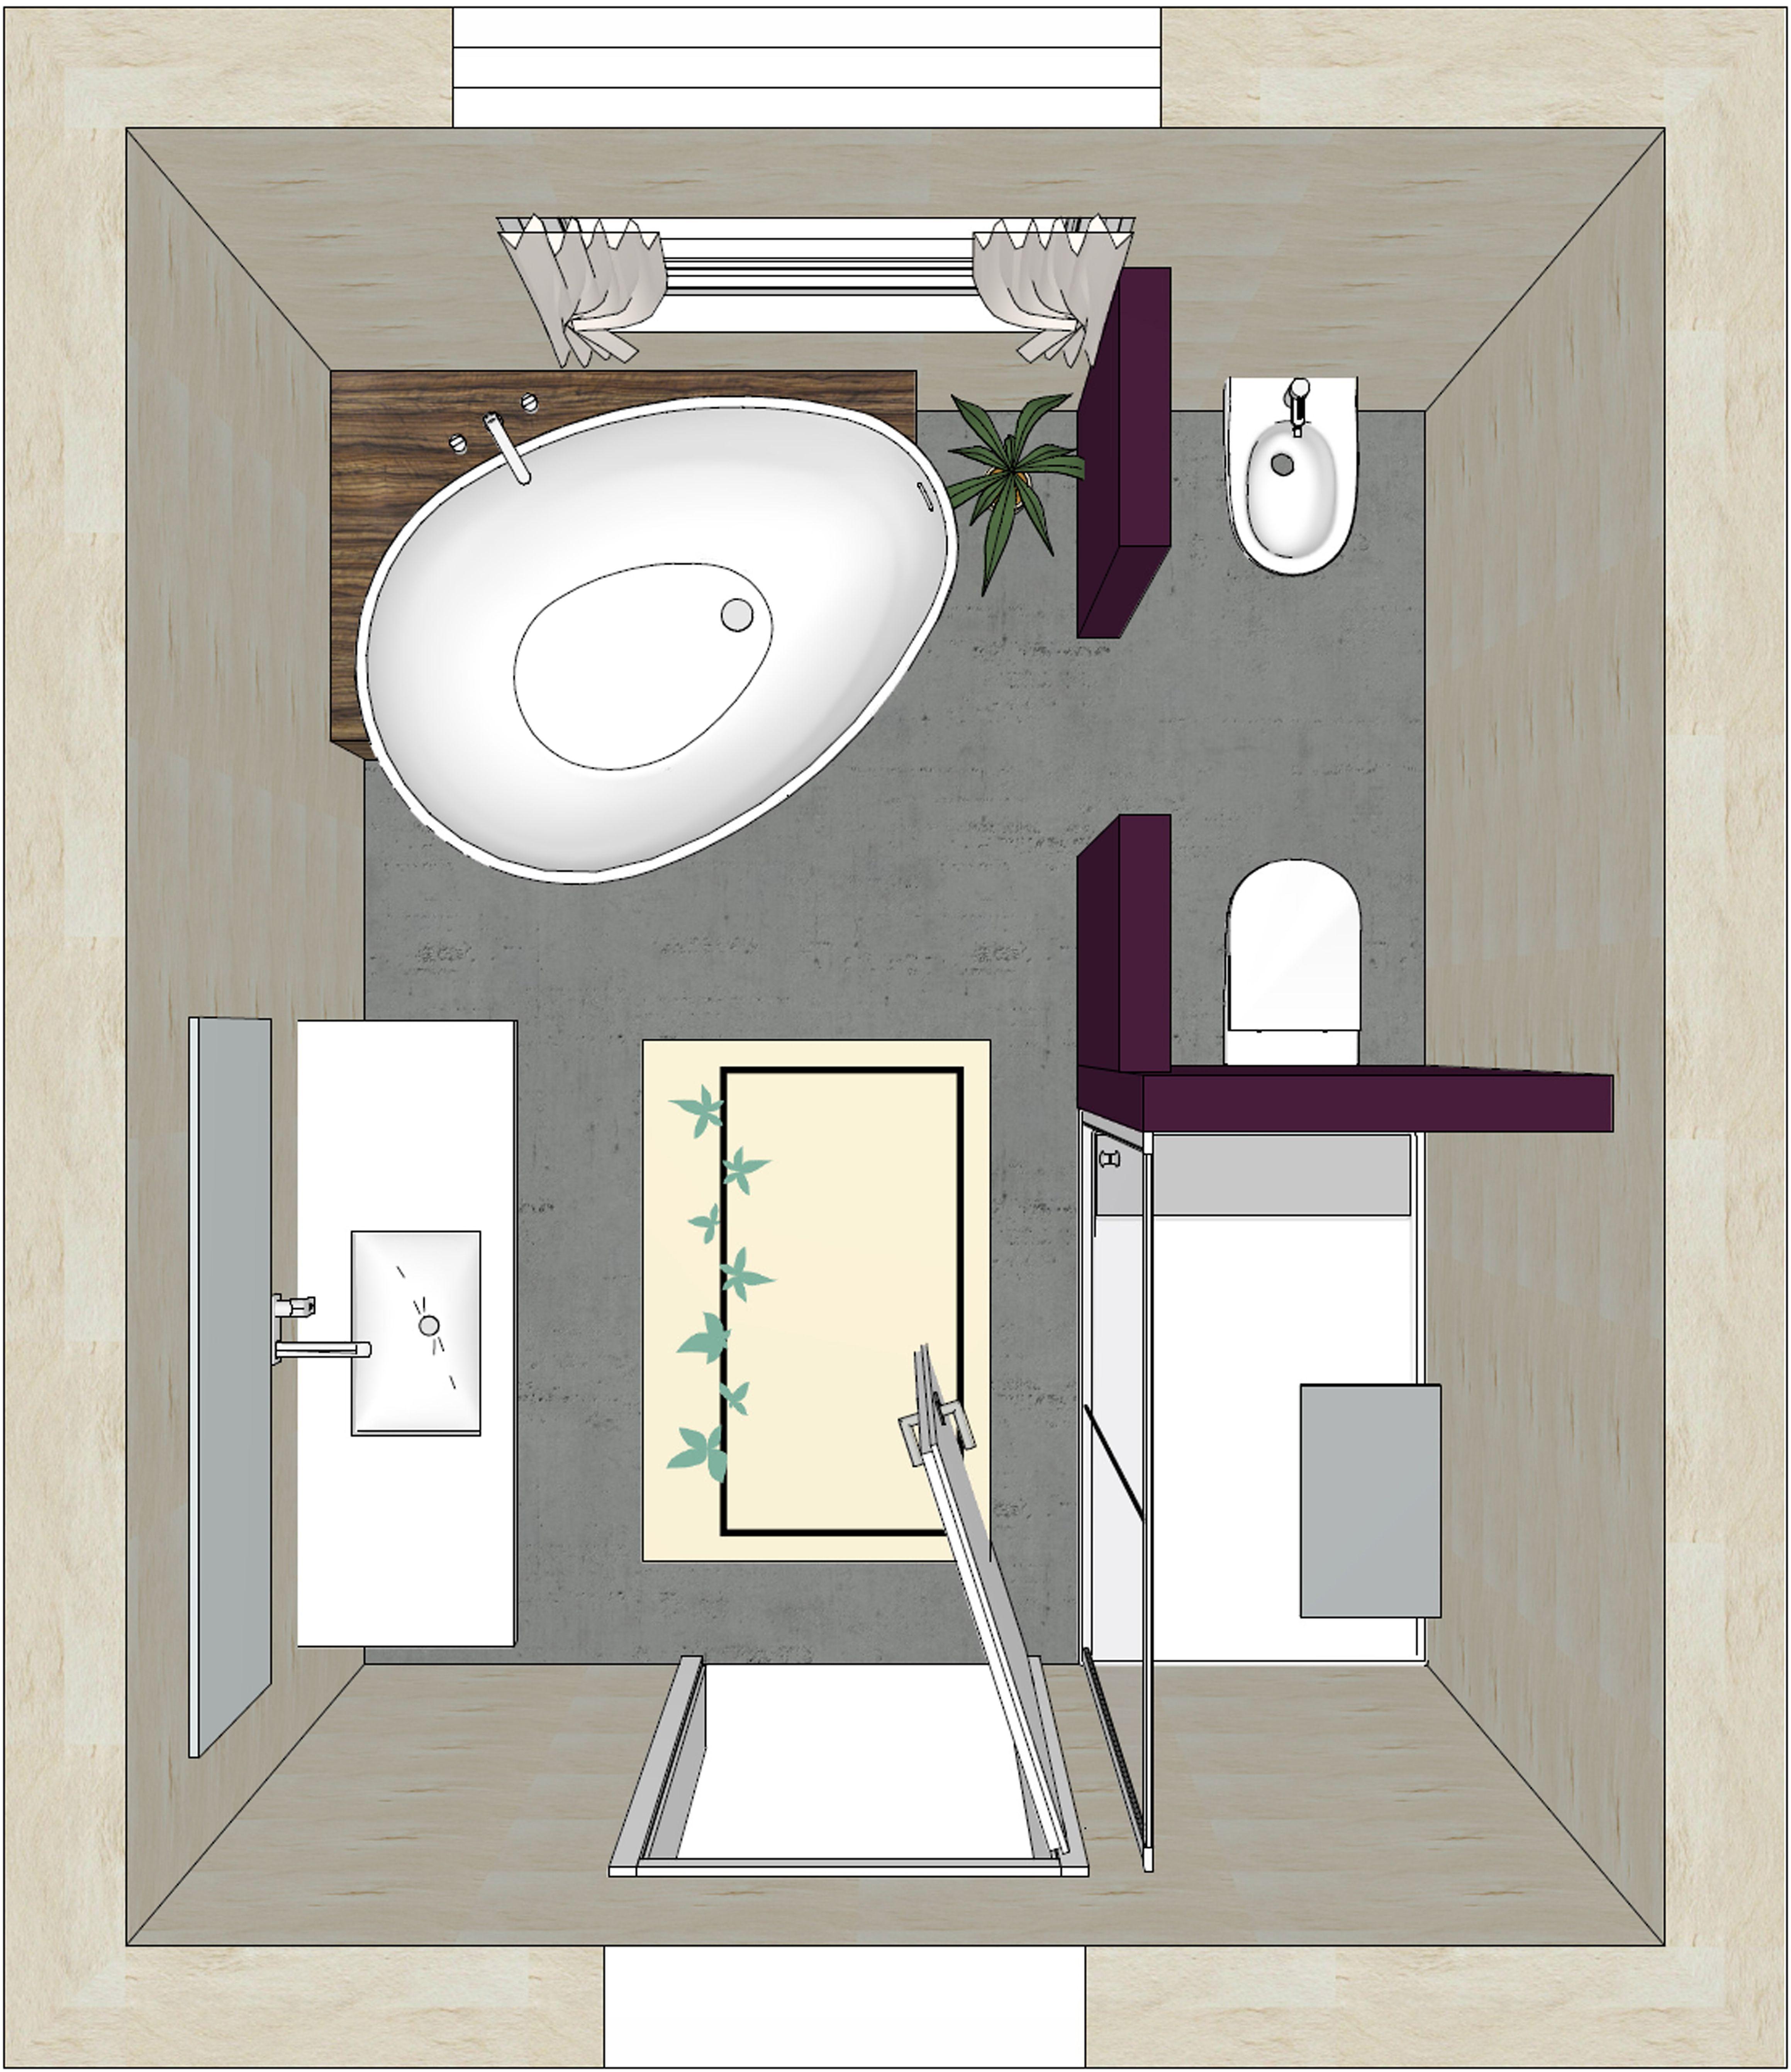 Plan Pour Une Salle De Bain Bad Grundriss Badezimmerideen Badezimmer